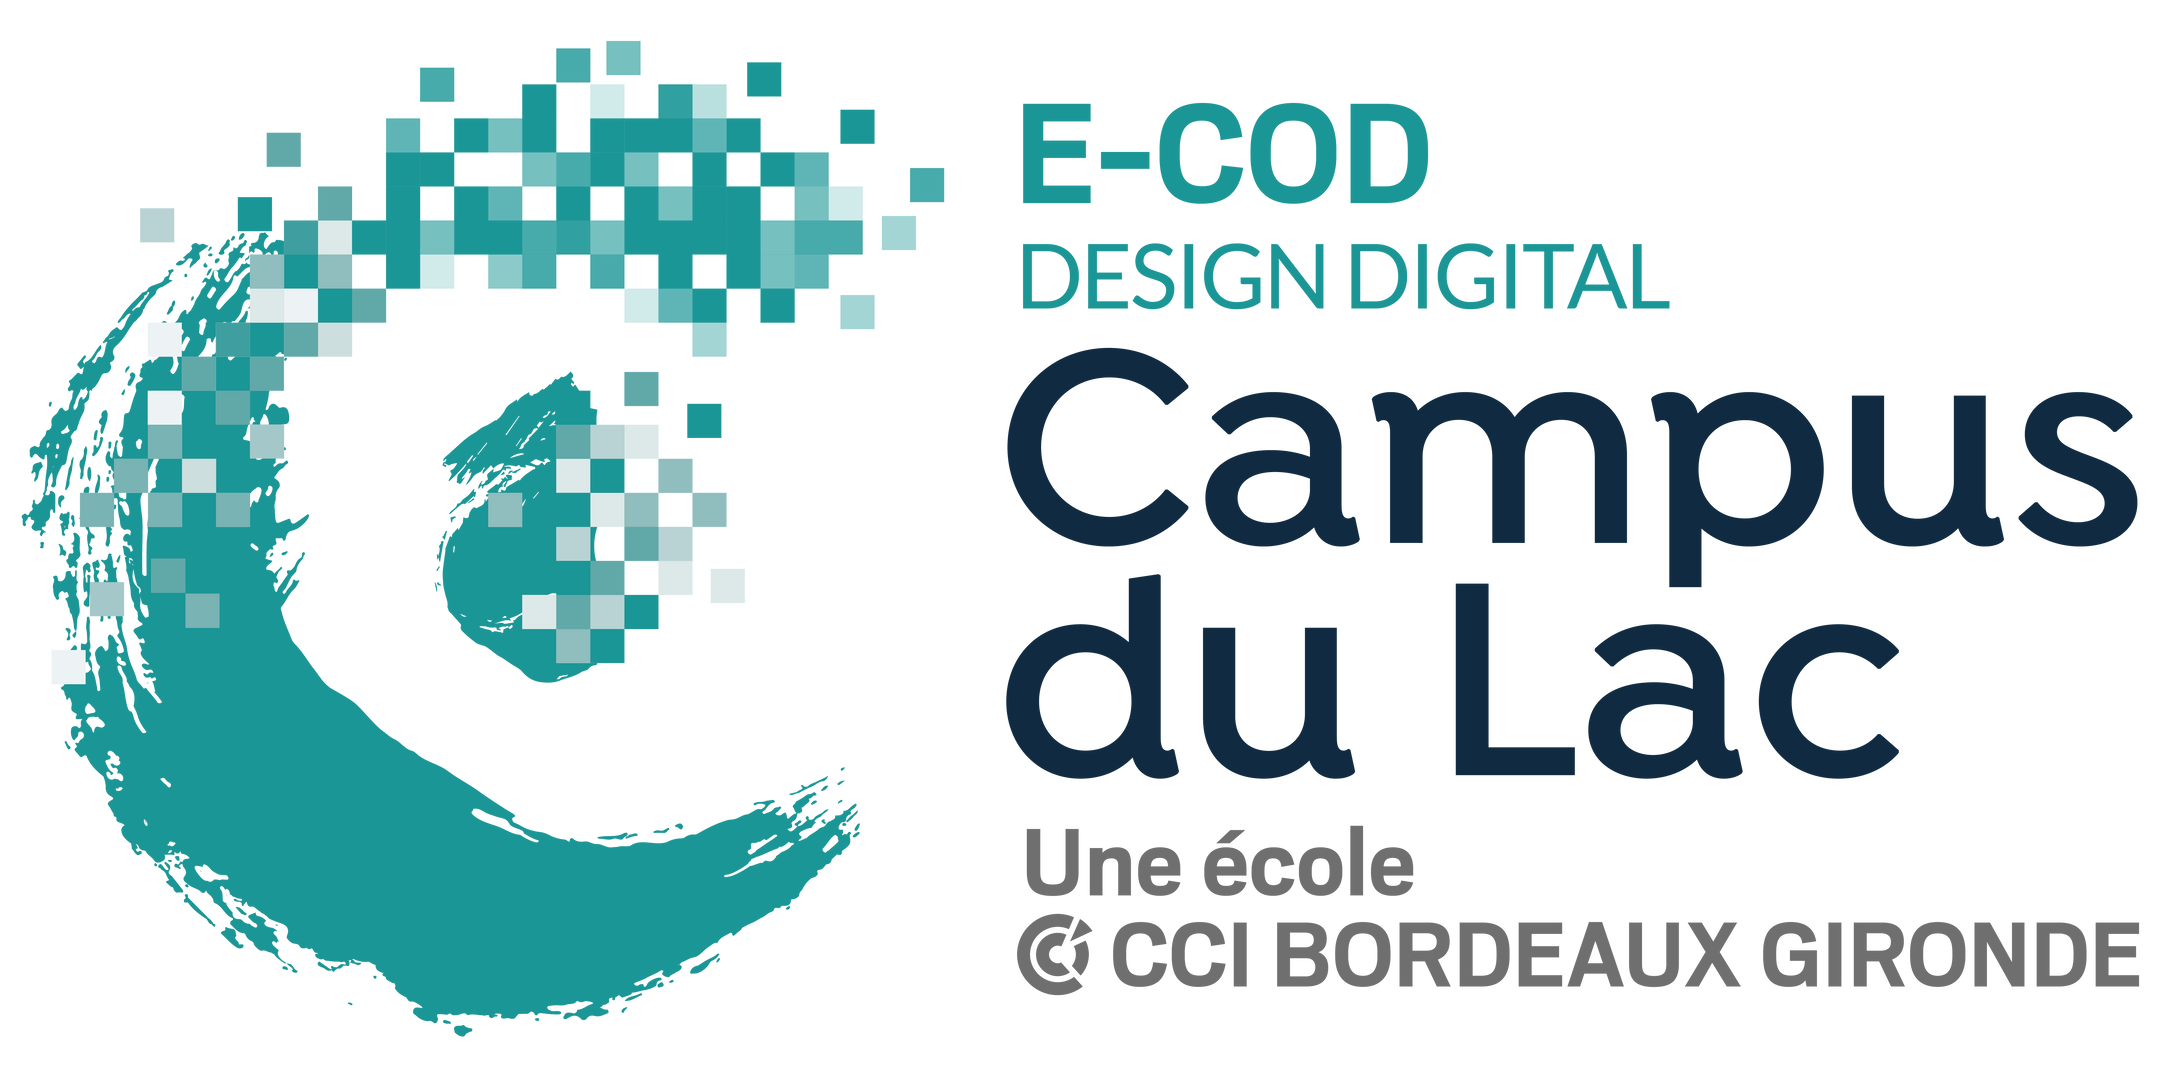 logo-E-COD.png